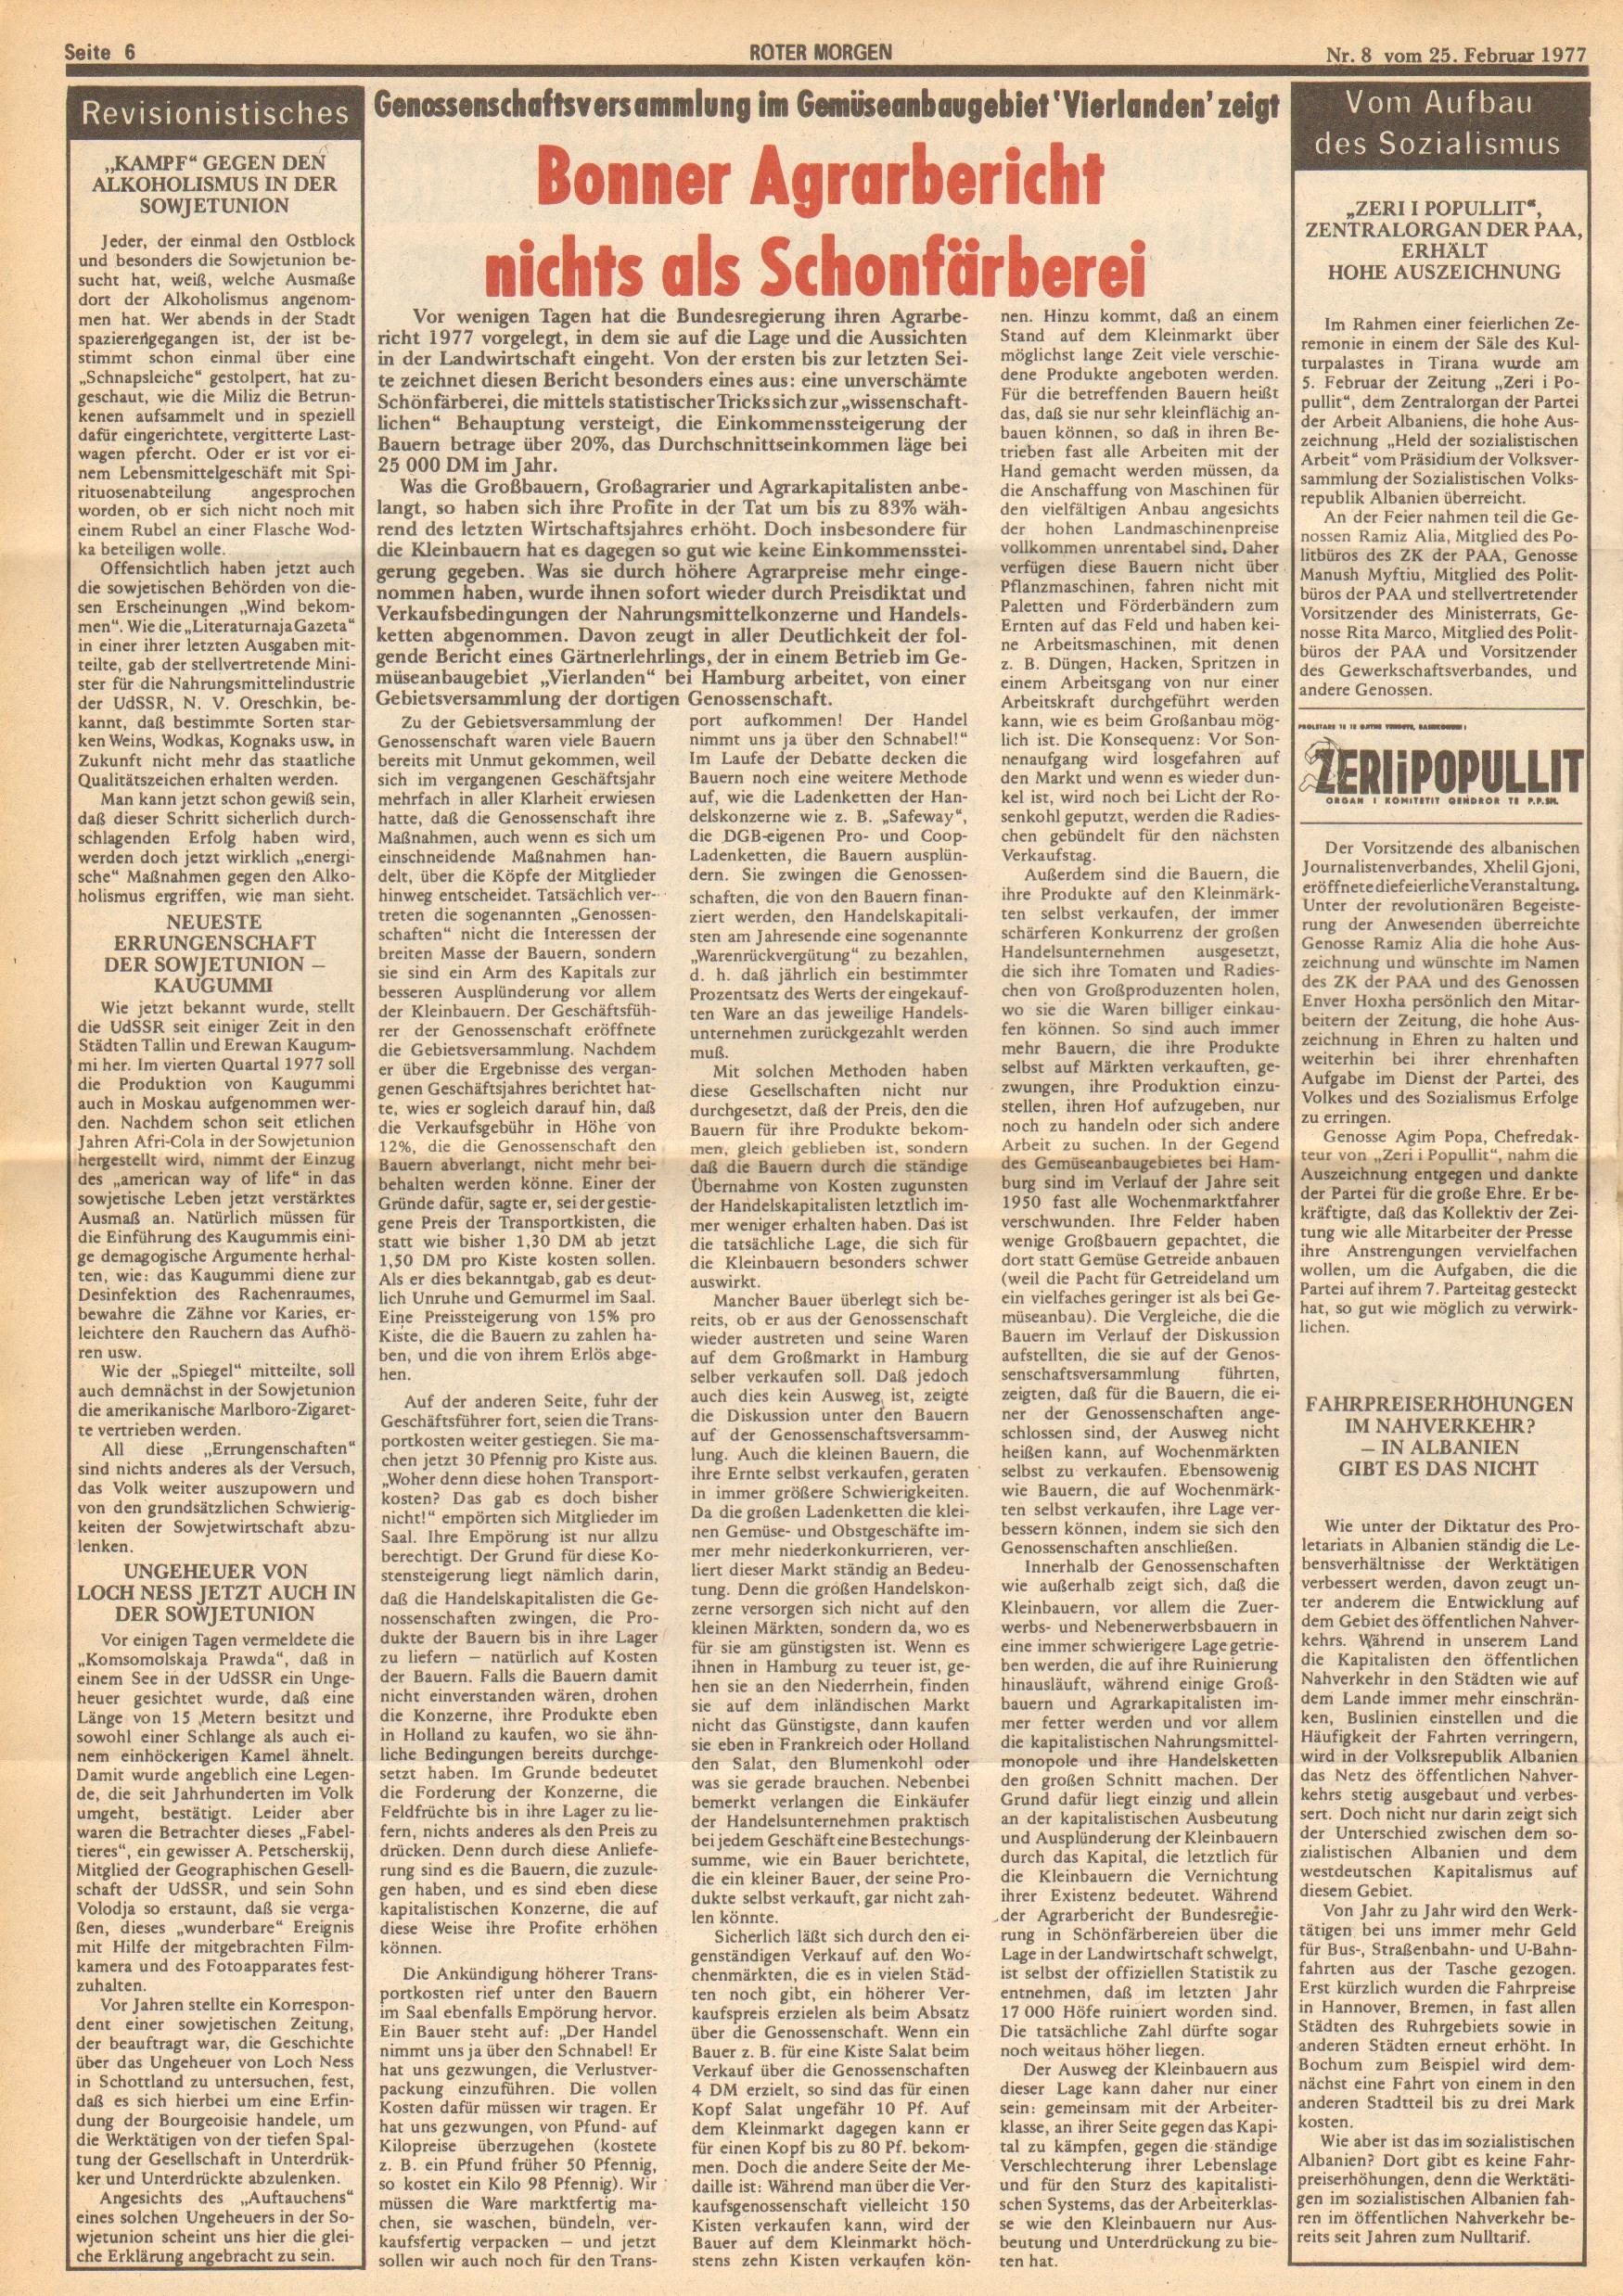 Roter Morgen, 11. Jg.,25. Februar 1977, Nr. 8, Seite 6